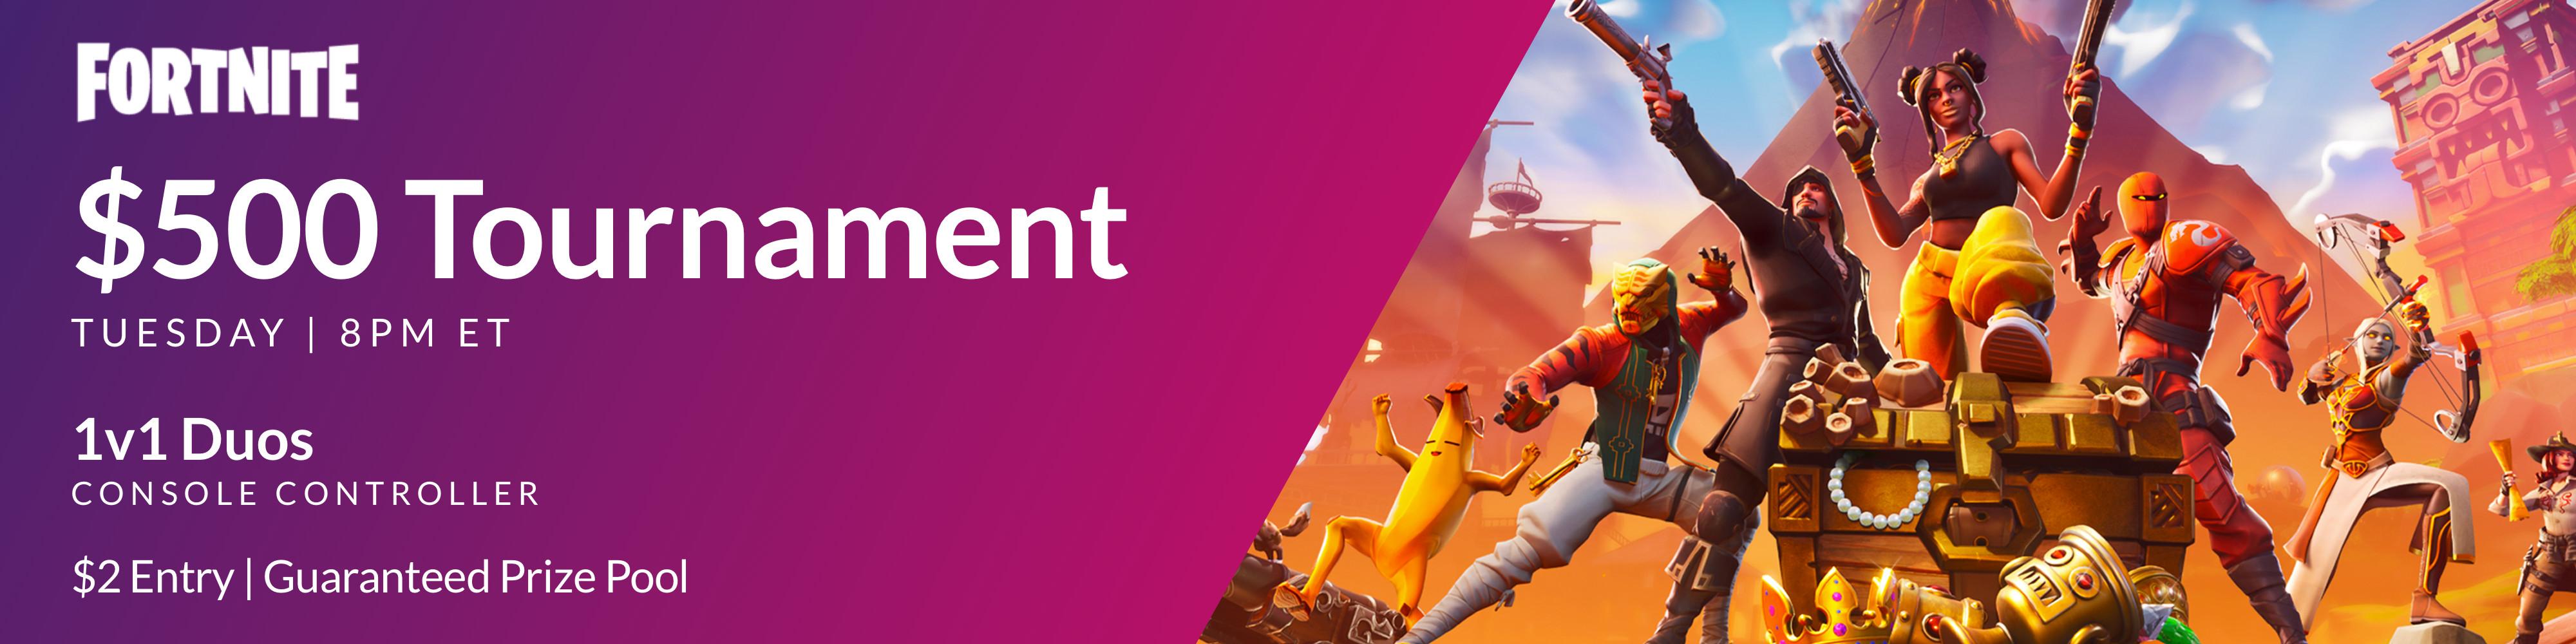 Players' Lounge - Tuesday $500 Fortnite Tournament